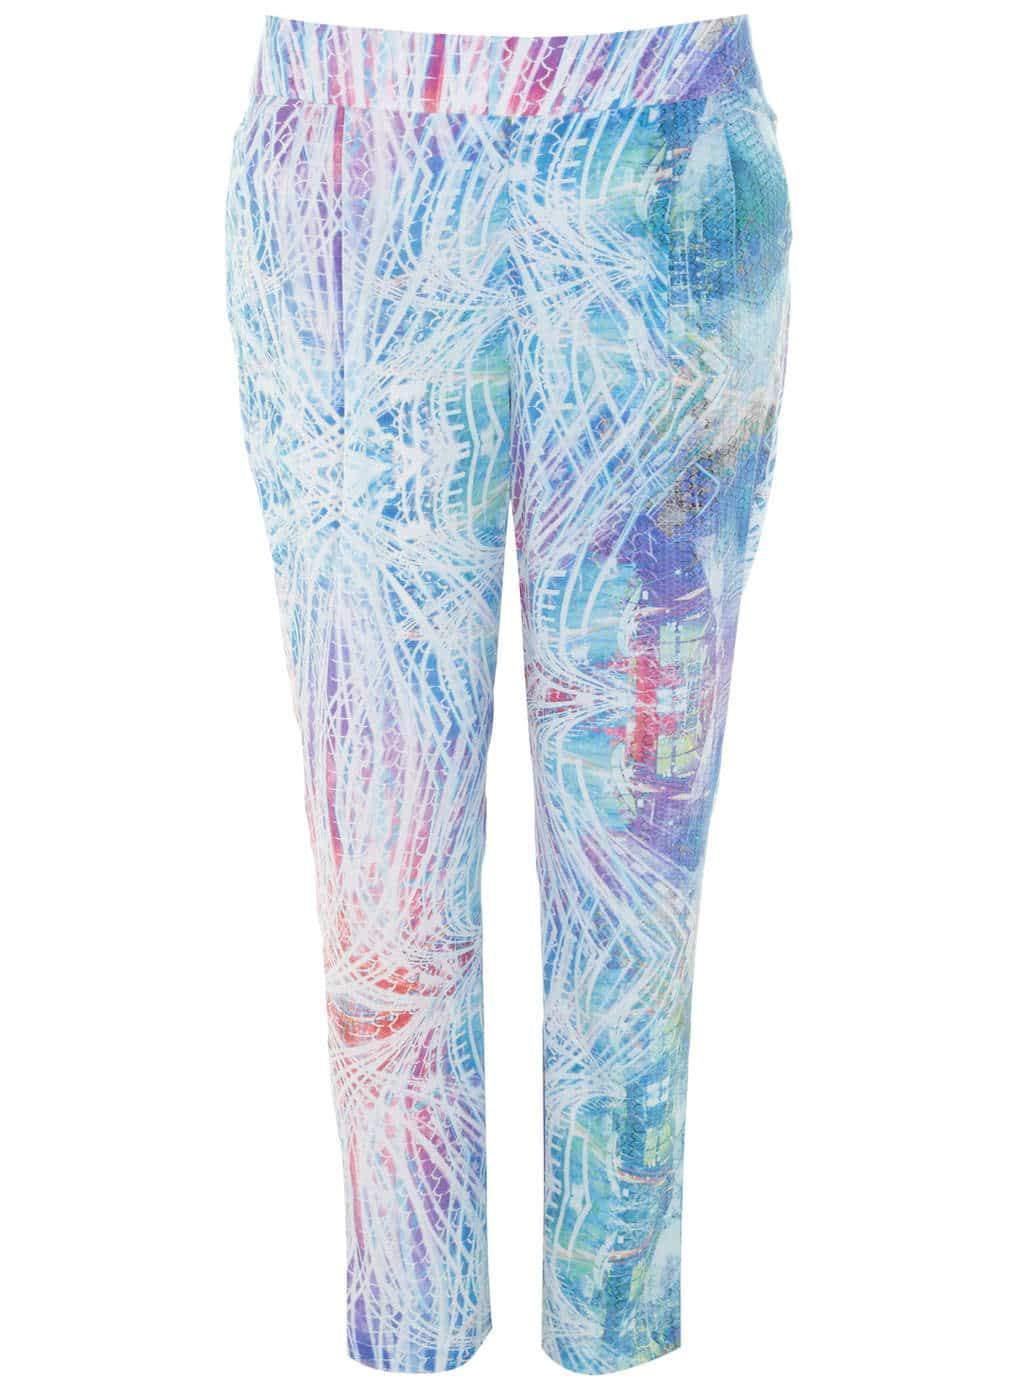 Cut for Evans Digital Print Trousers